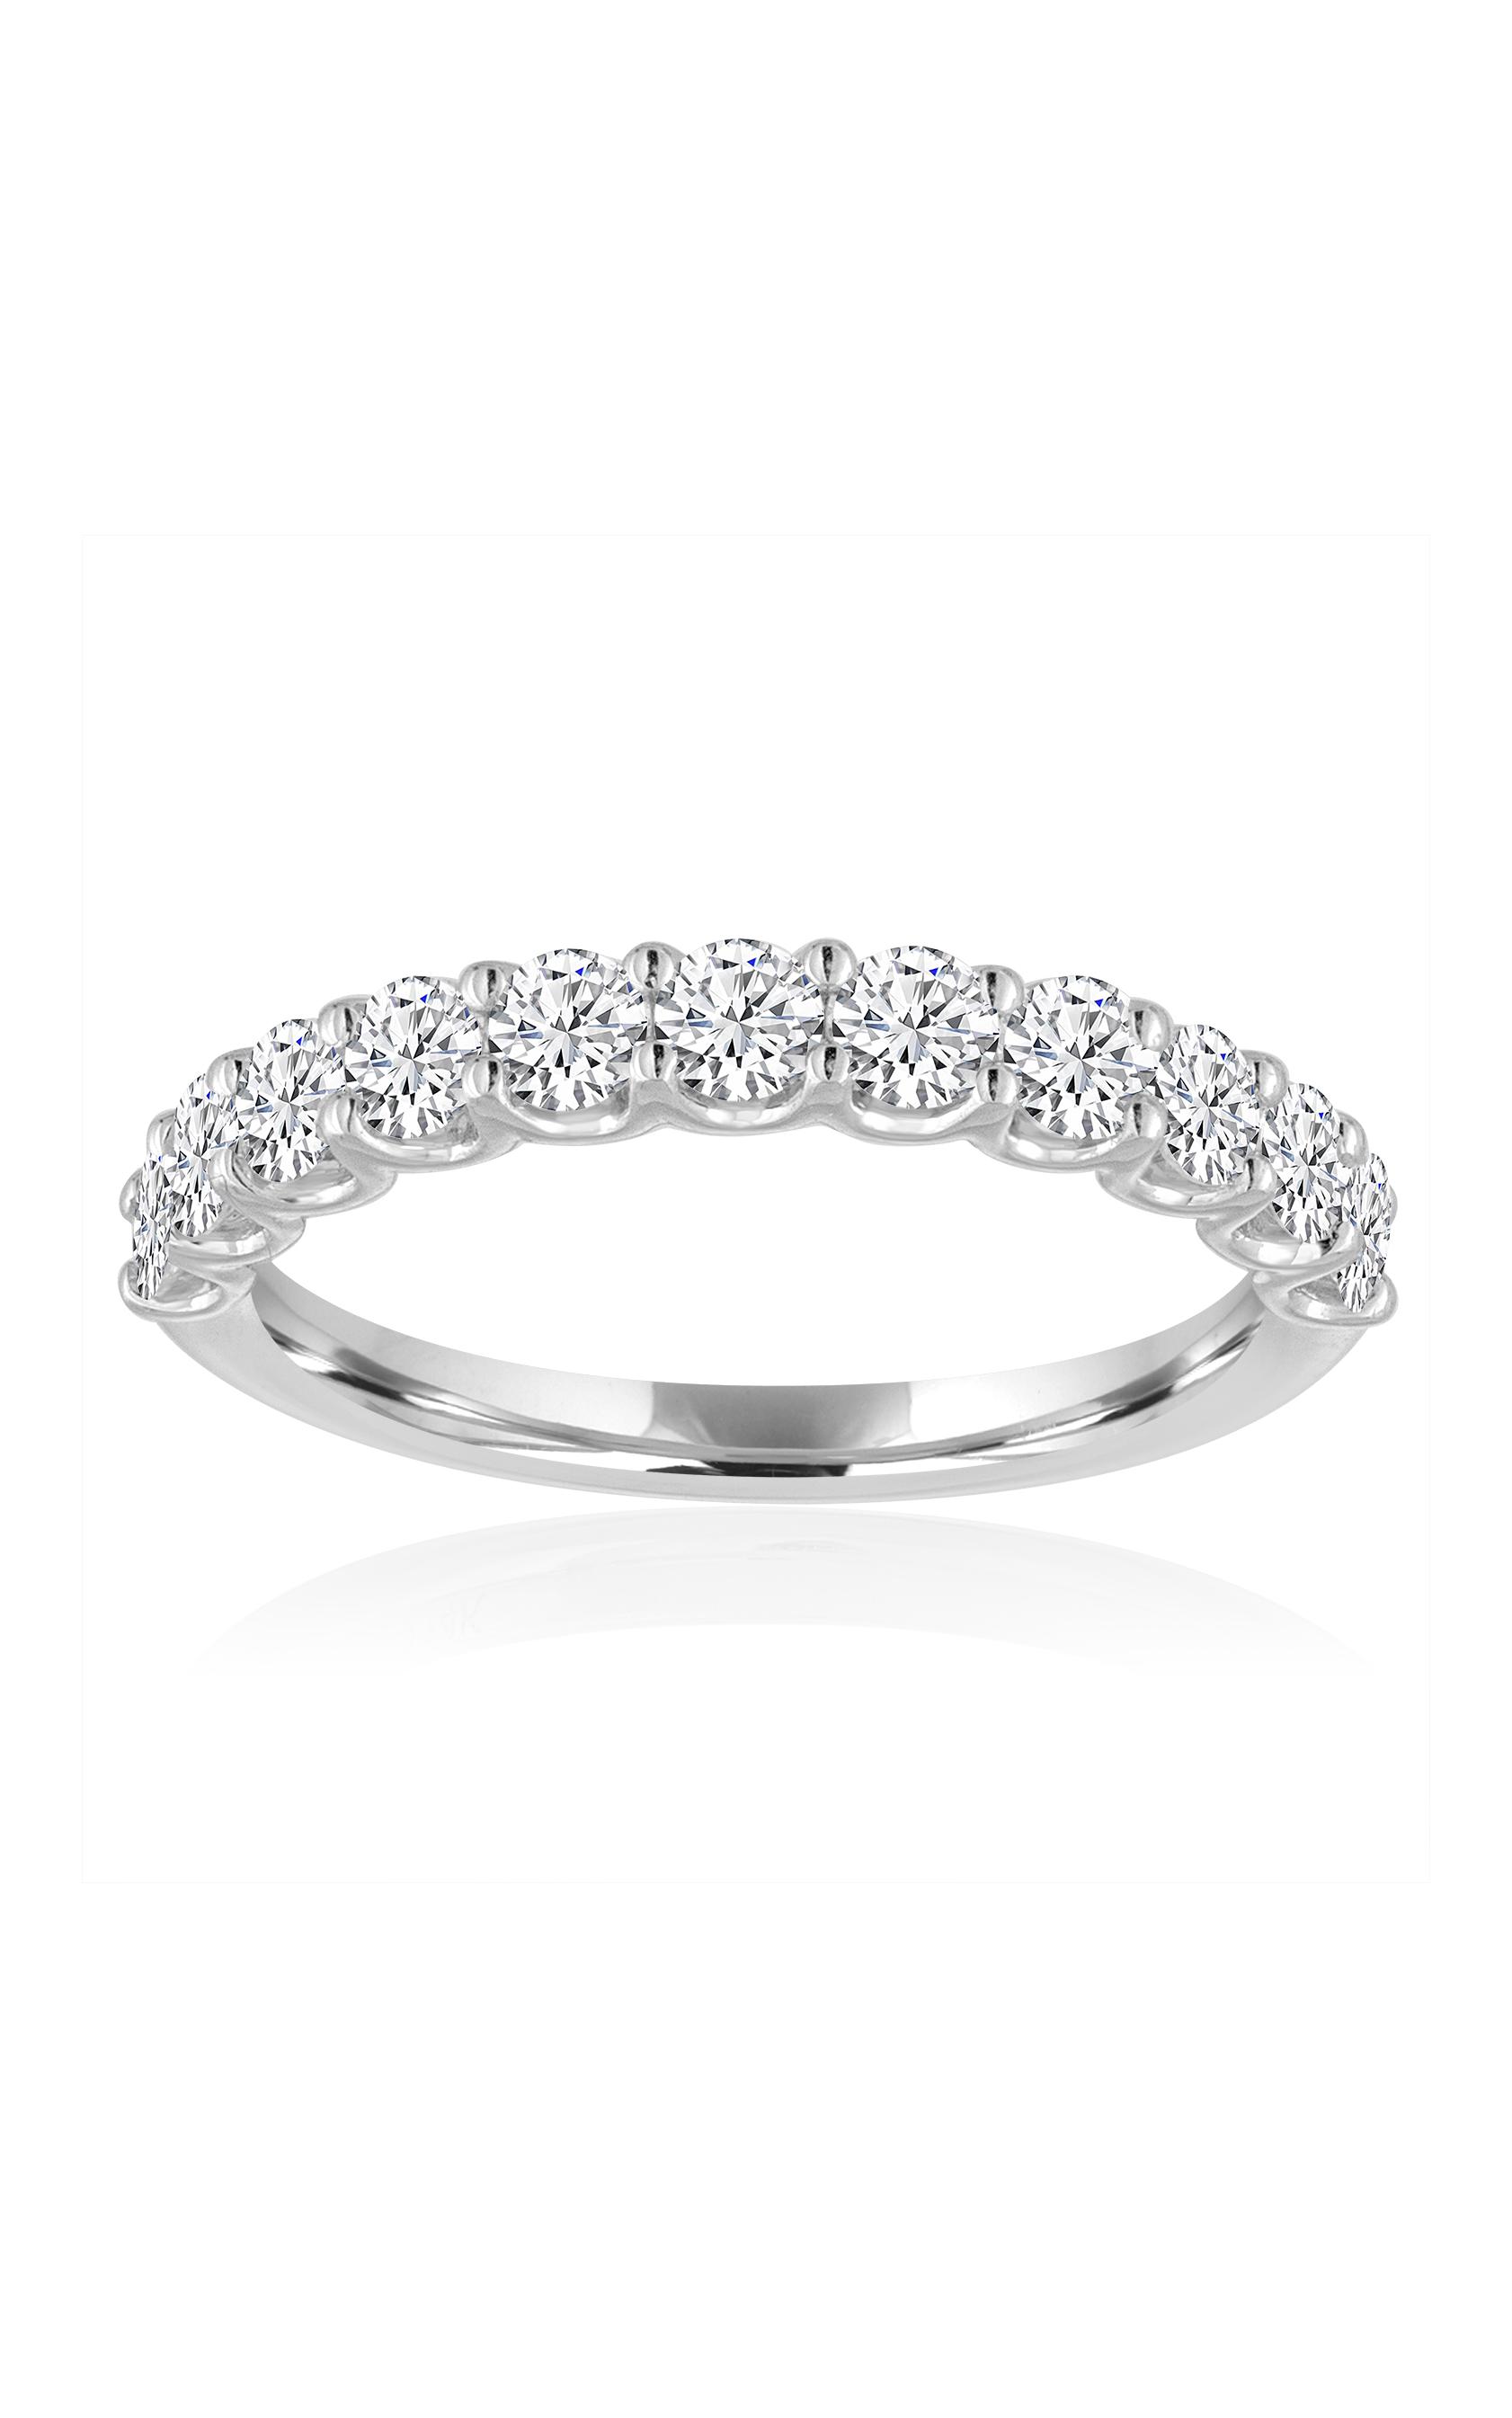 Imagine Bridal Fashion Rings 77816D-1 2 product image